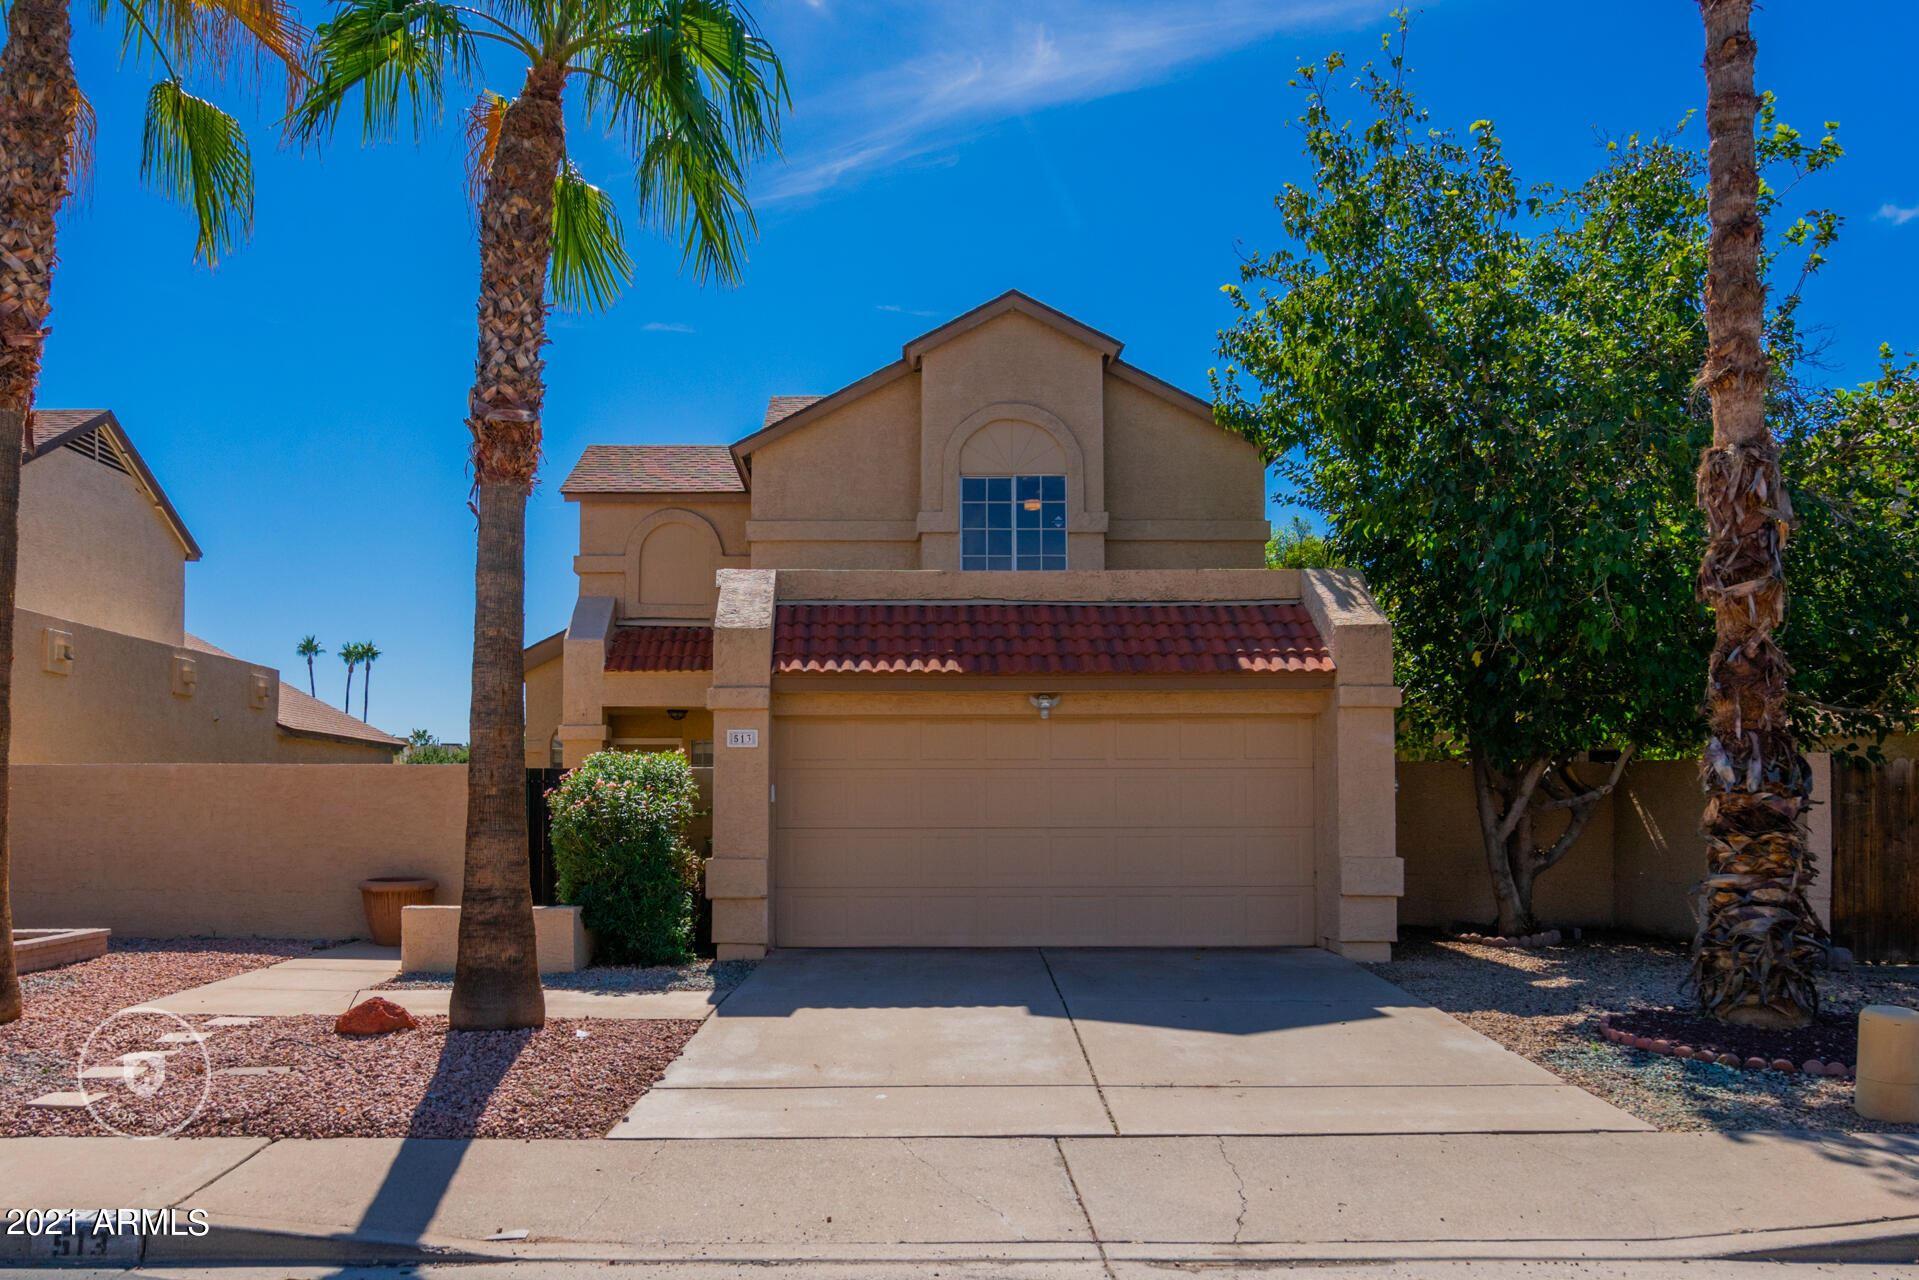 513 E UTOPIA Road, Phoenix, AZ 85024 - MLS#: 6311169